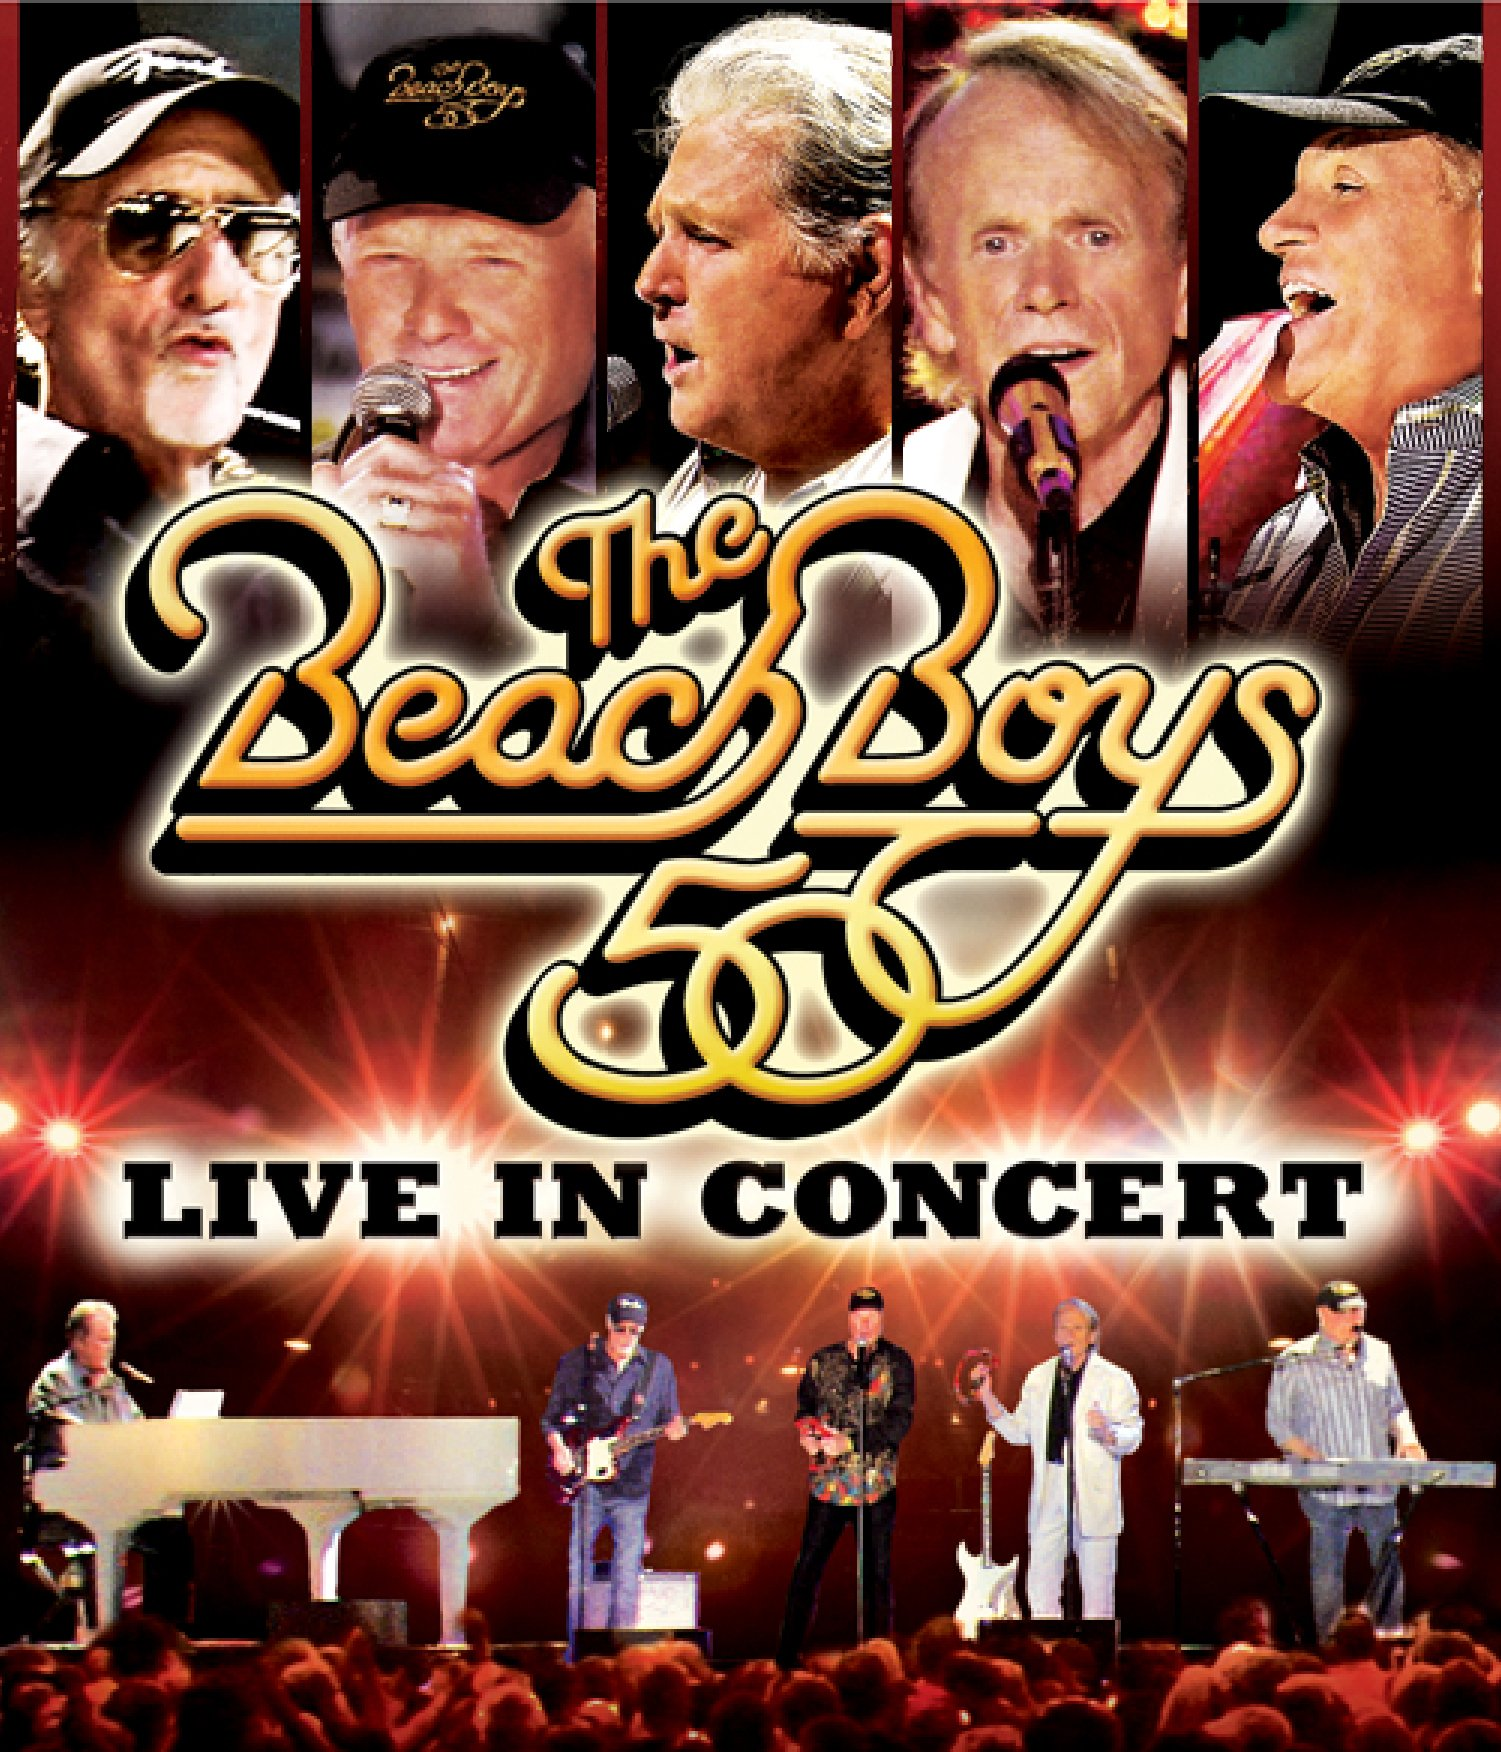 DVD : The Beach Boys - The Beach Boys: Live in Concert: 50th Anniversary Tour (DVD)